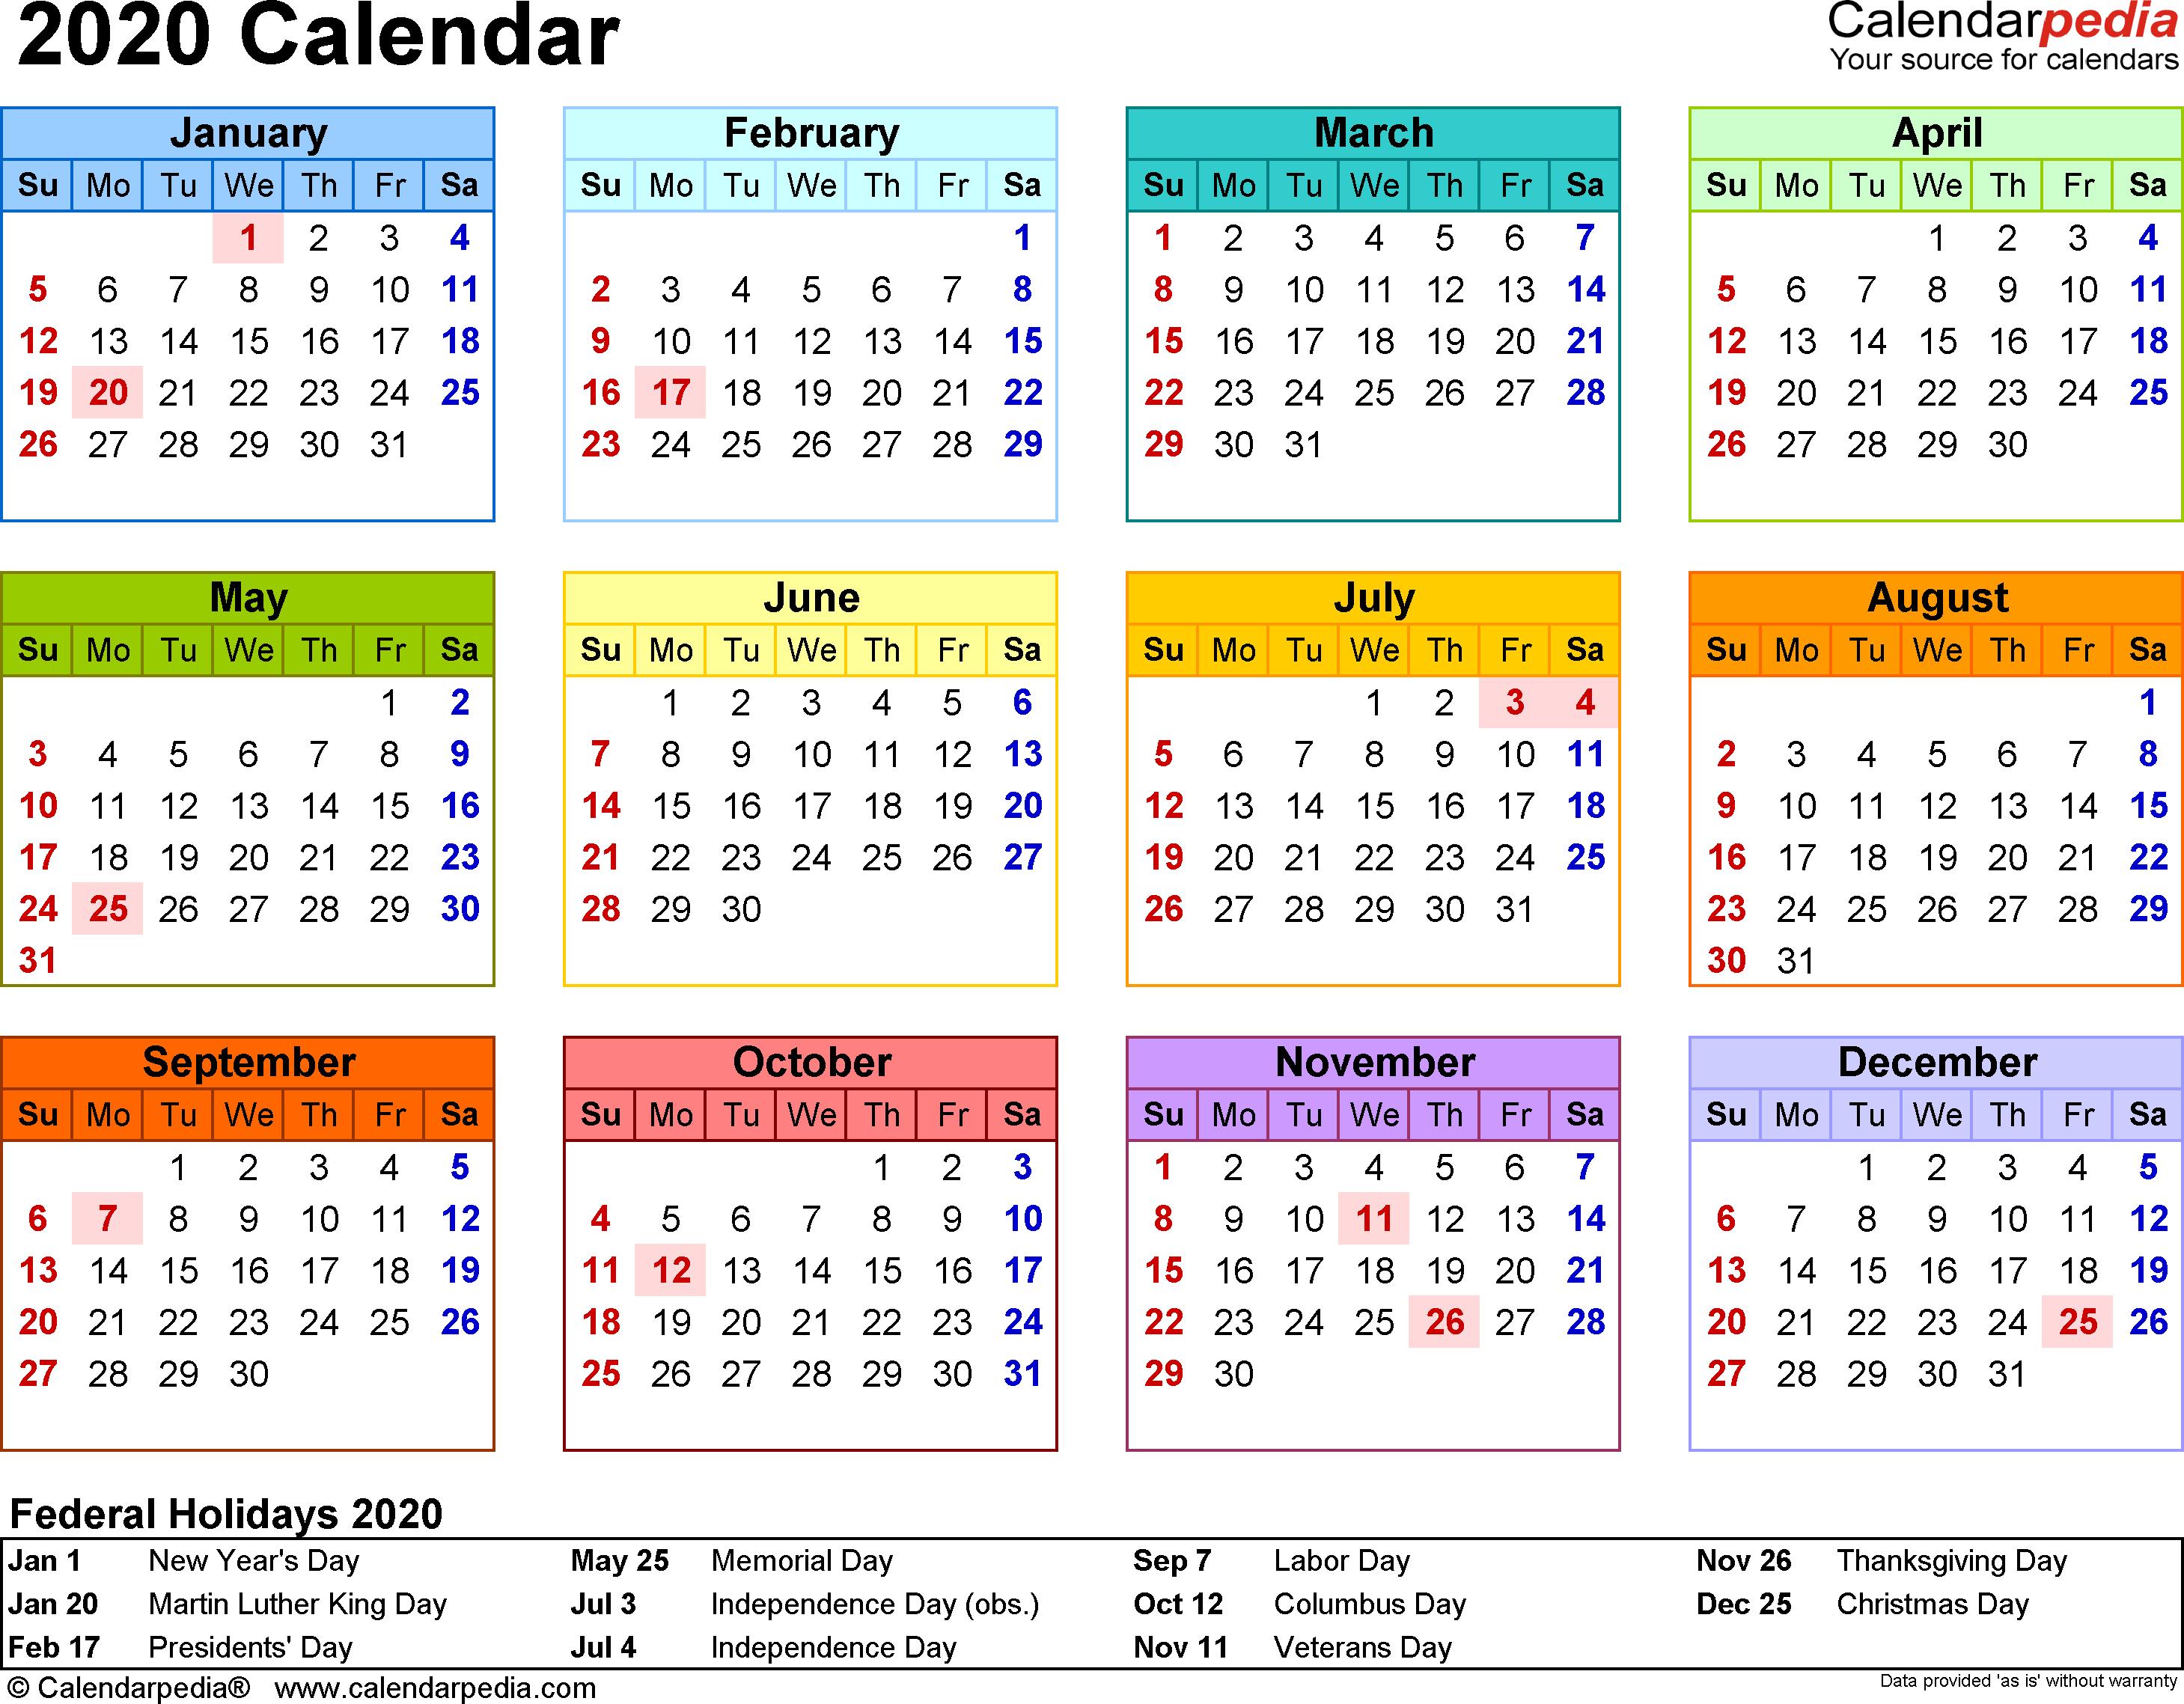 2020 Calendar - 18 Free Printable Word Calendar Templates